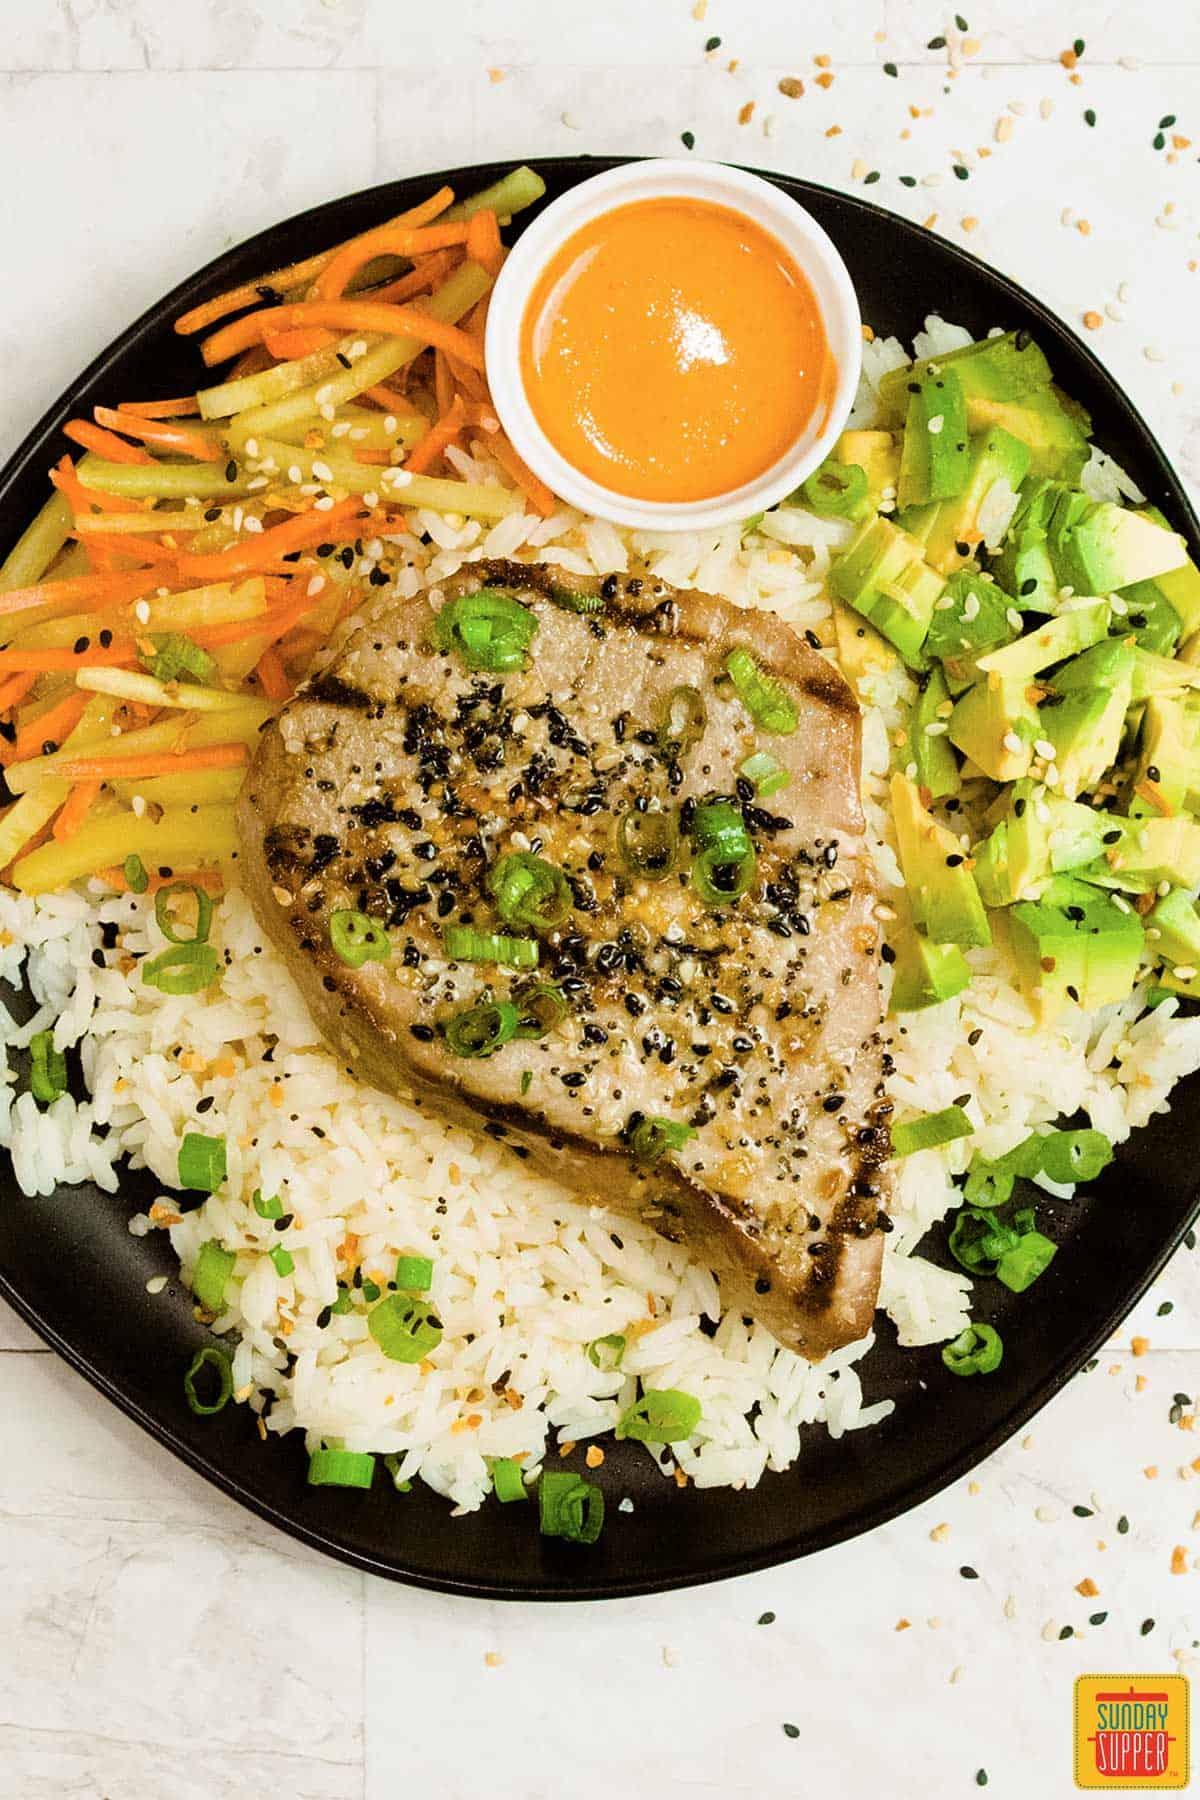 Tuna steak on a black plate seasoned with veggies